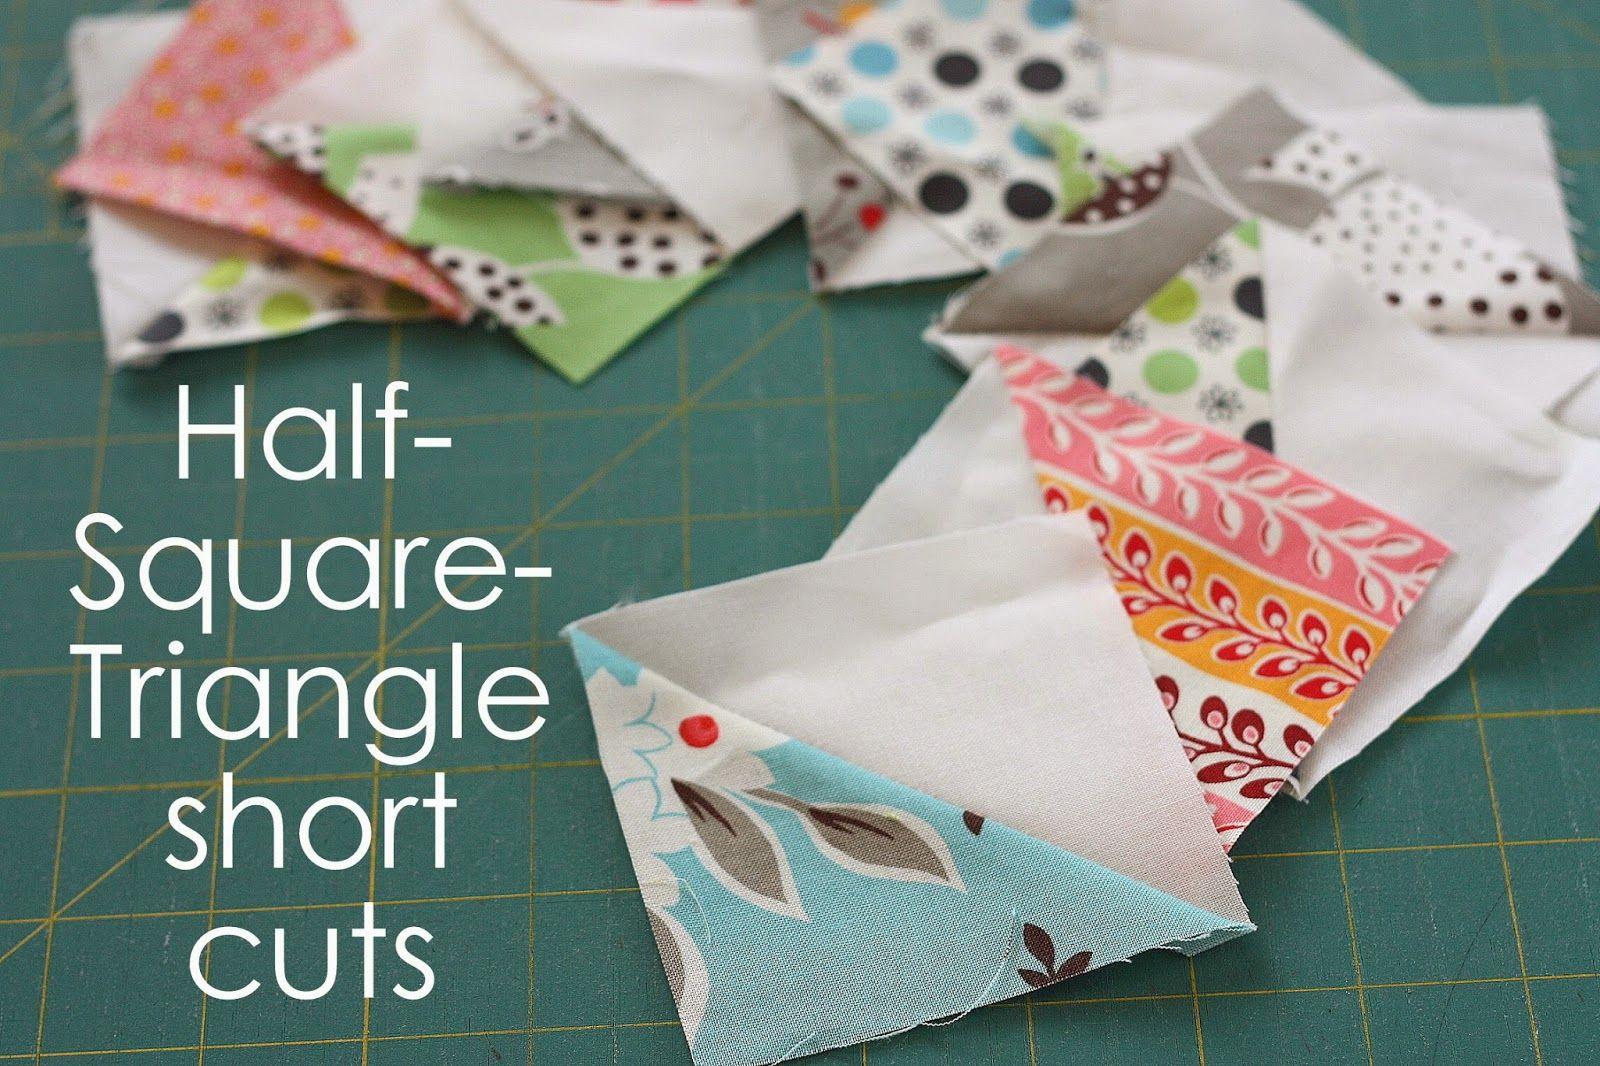 Quilt Block Construction Tips   Half square triangles, Triangles ... : quilting triangles tips - Adamdwight.com